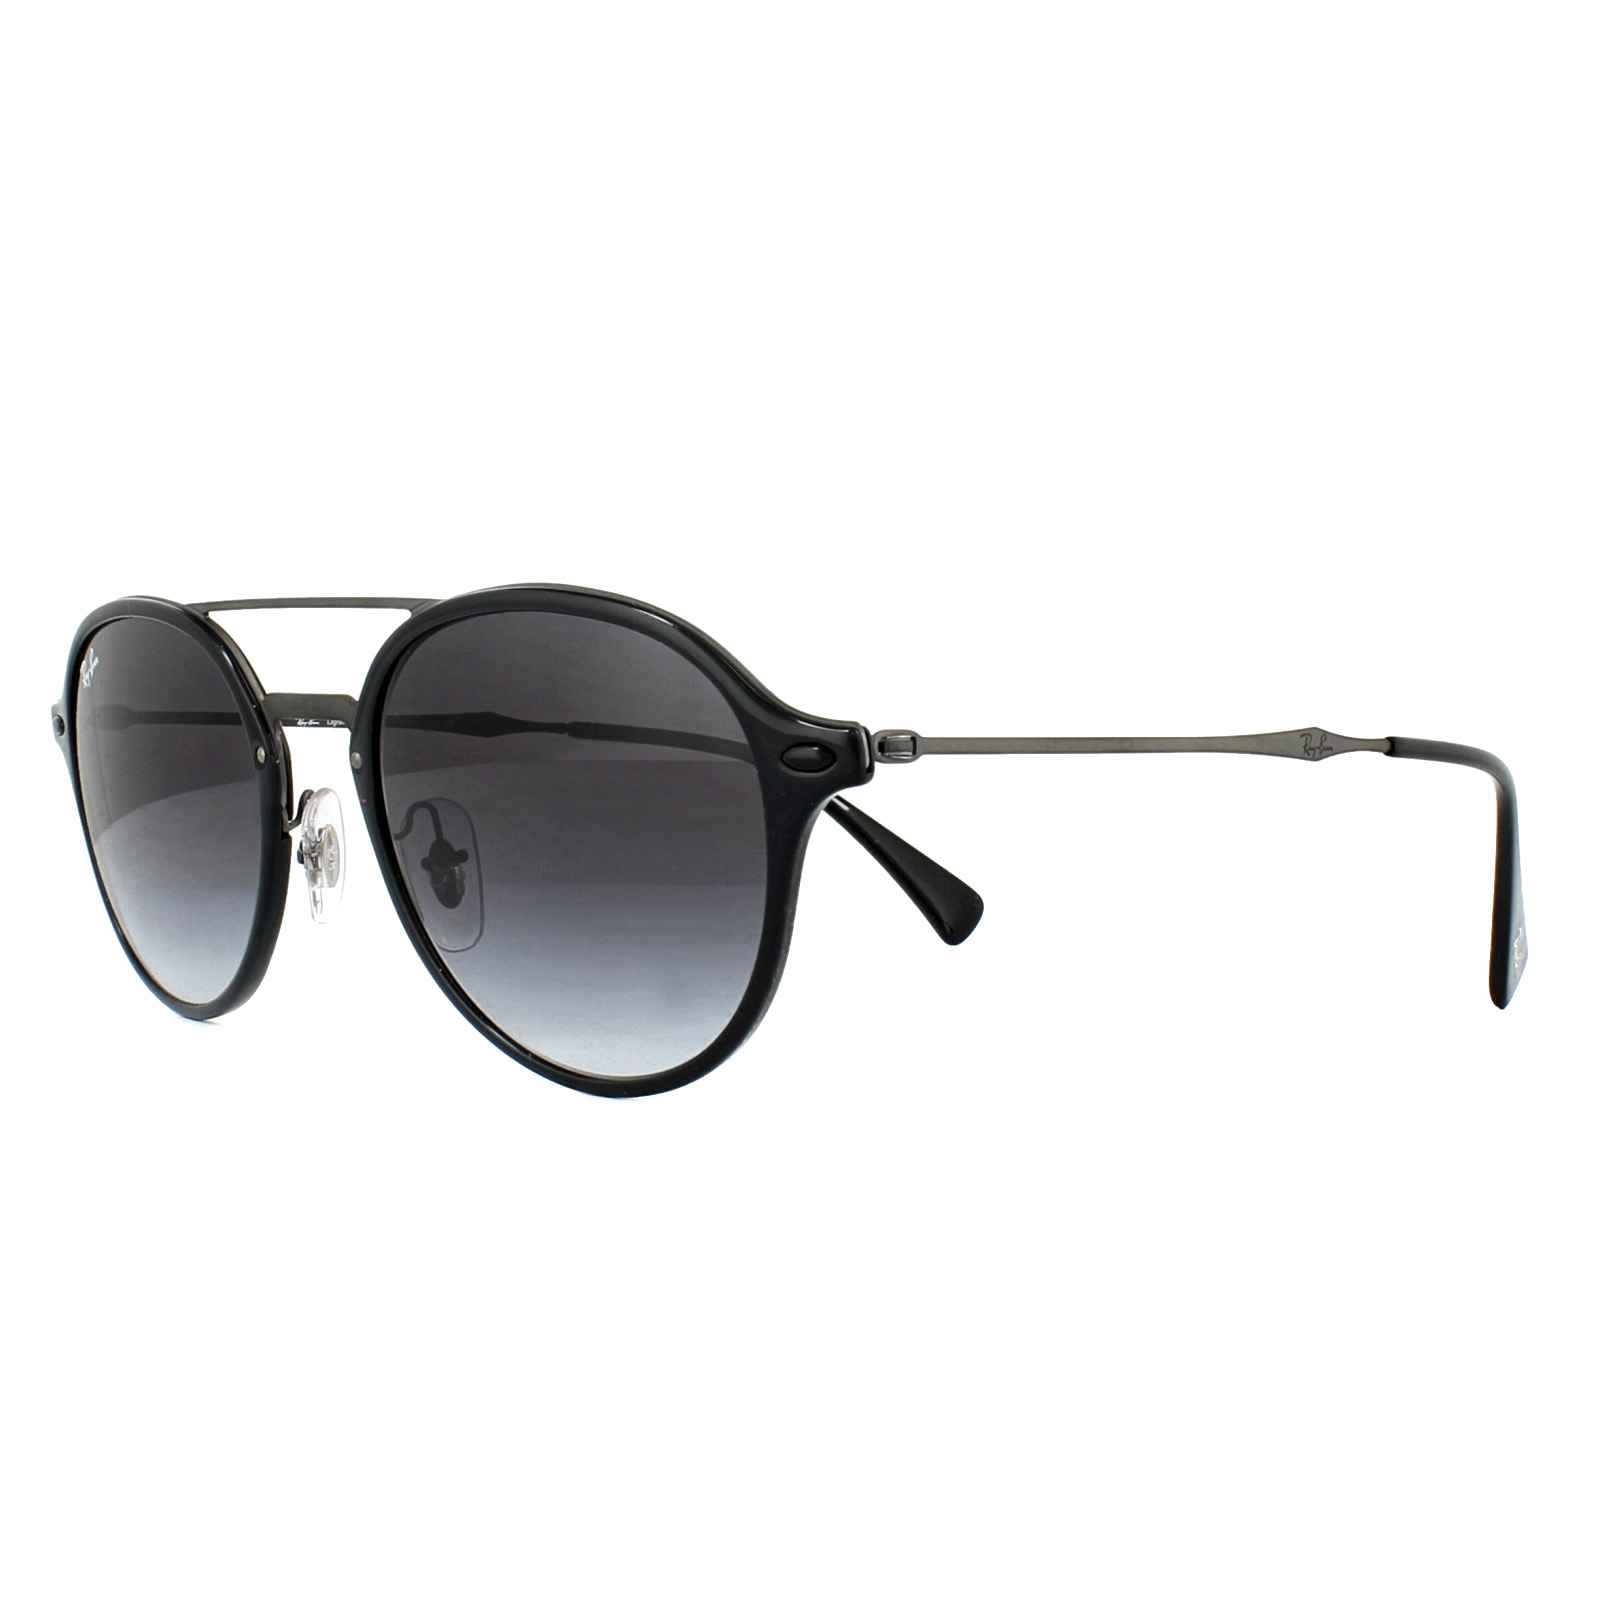 71ae5225225 Sentinel Ray-Ban Sunglasses 4287 601 8G Black Gunmetal Grey Gradient